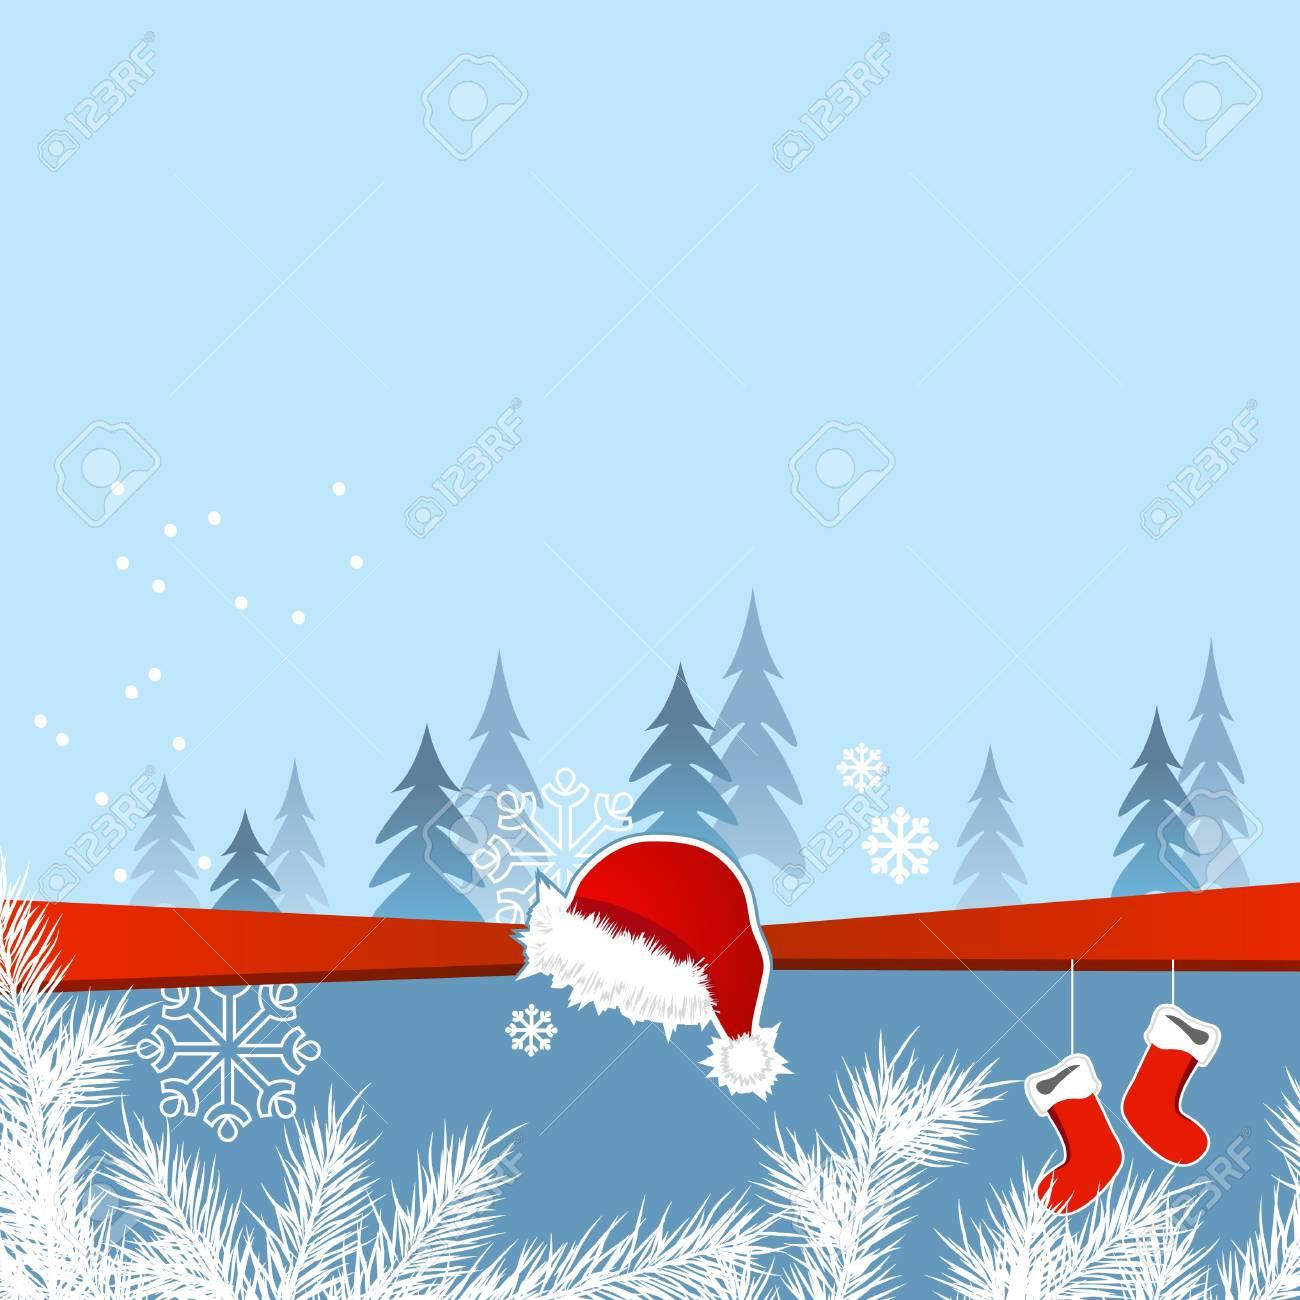 Christmas greeting card with santa cap and socks Stock Vector - 10448680